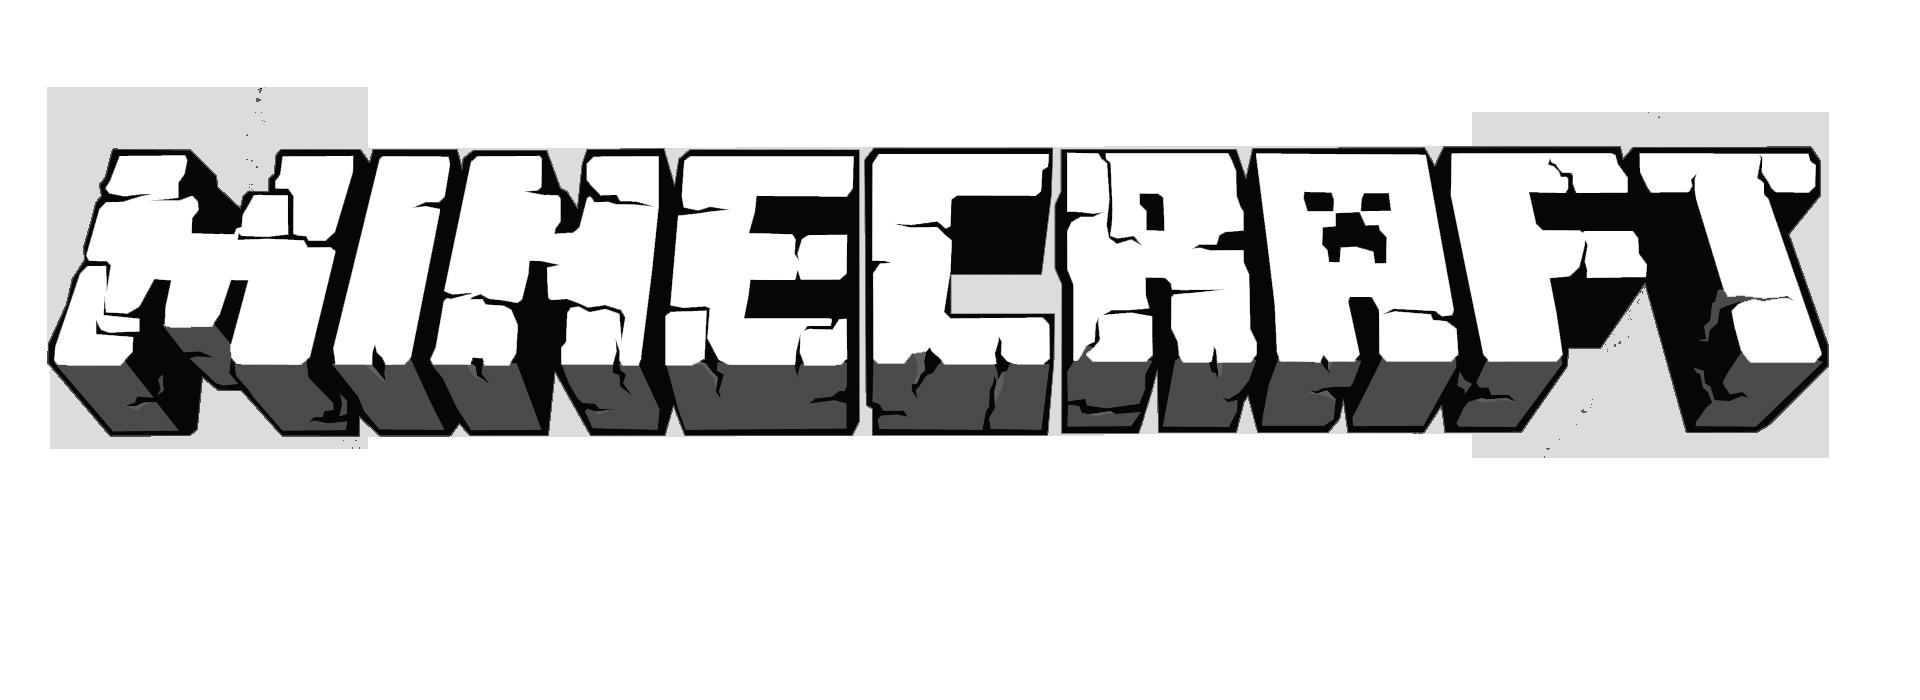 Minecraft Logo Transparent แฟนพันธุ์แท้